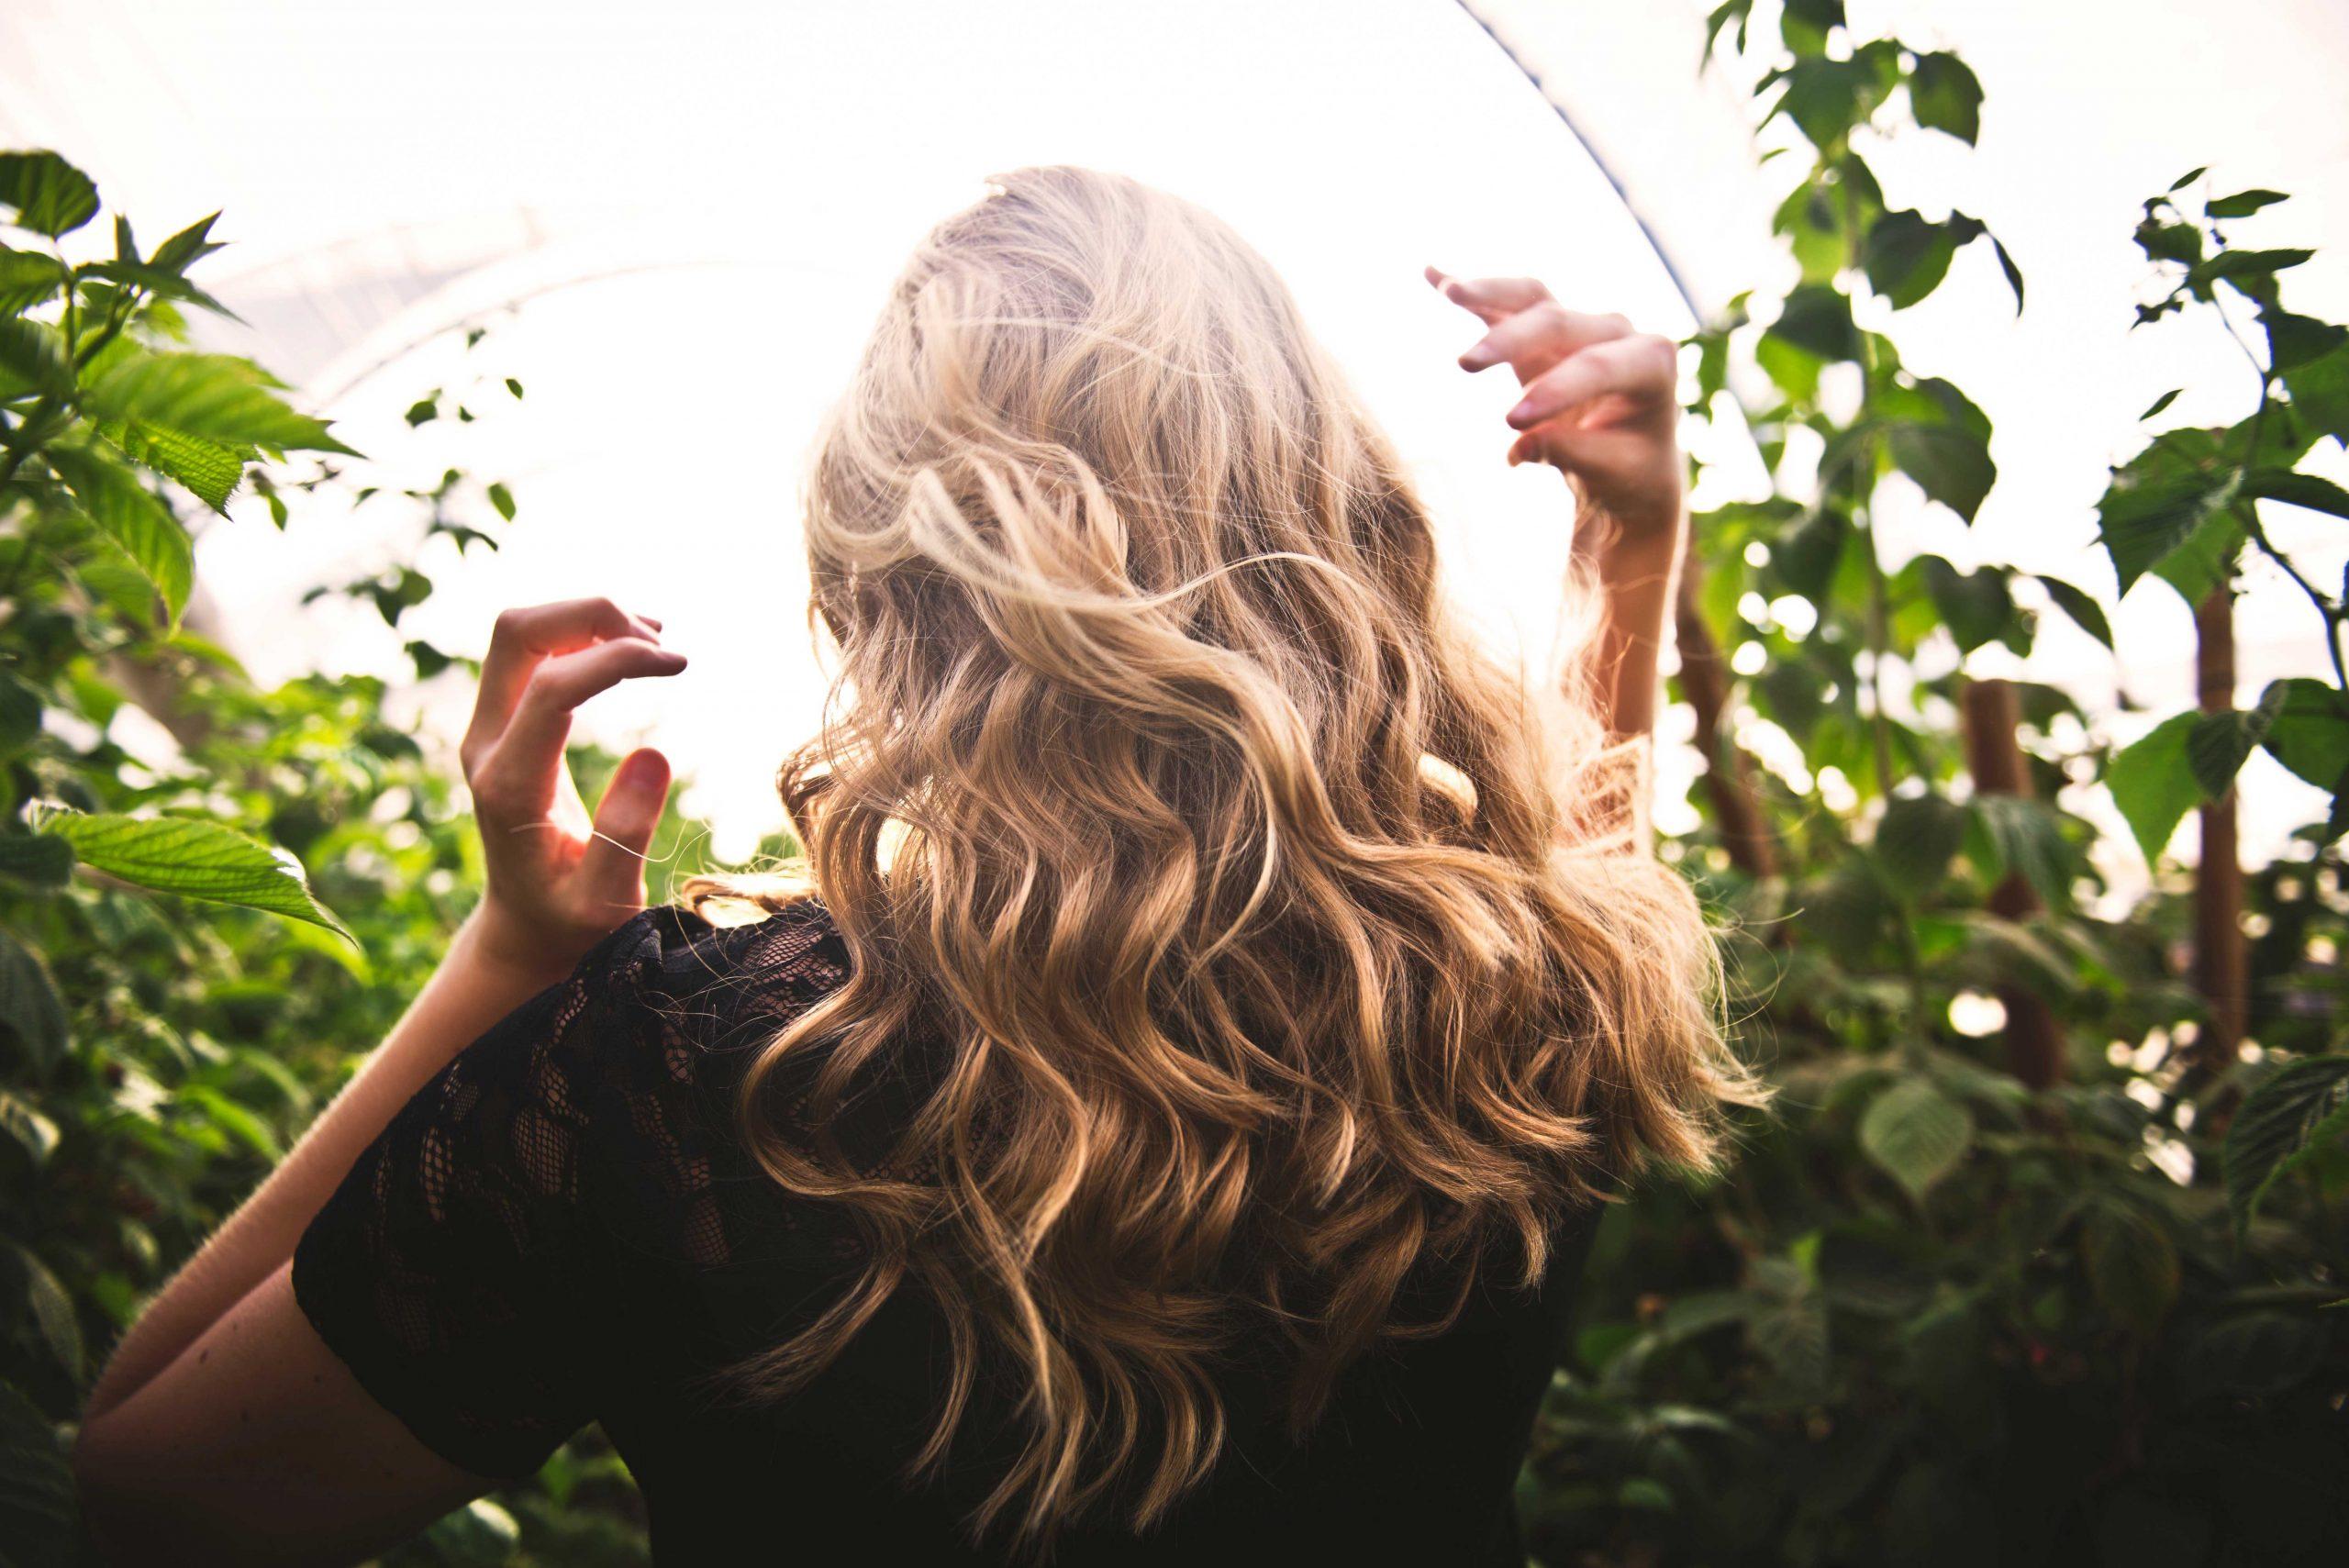 coloration bio salon coiffeur lyon 8 lyon 7 lyon 3 montplaisir hairborist coiffure